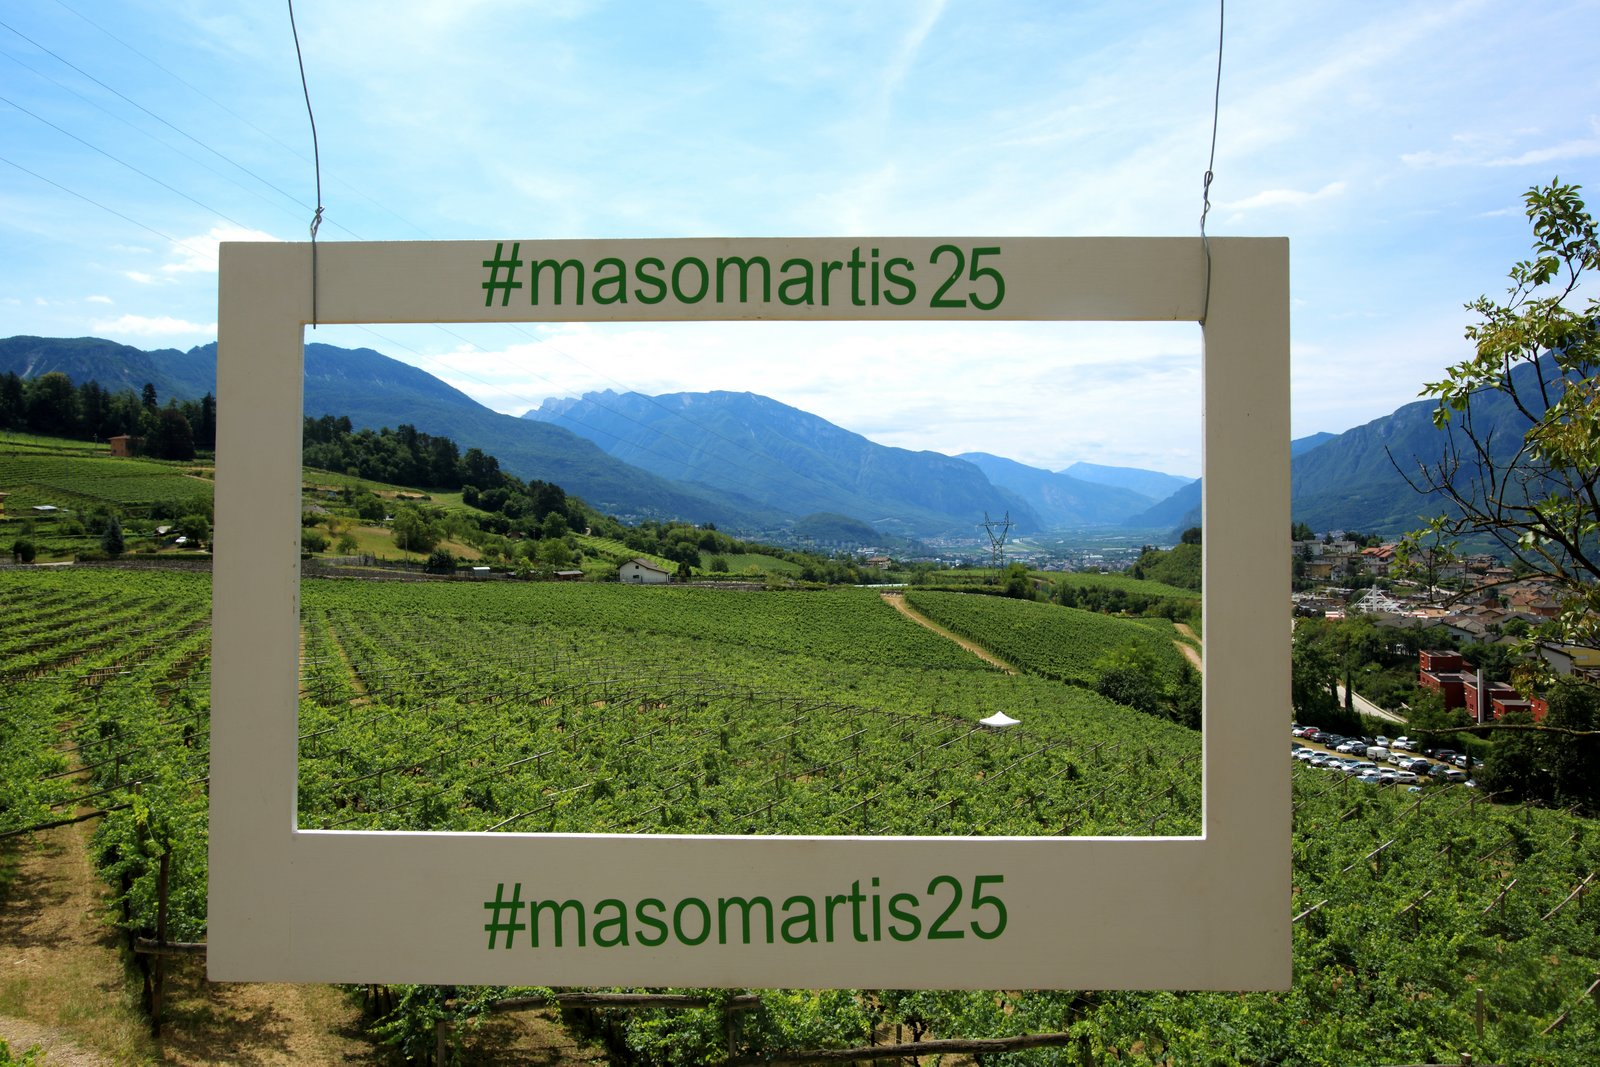 masomartis25